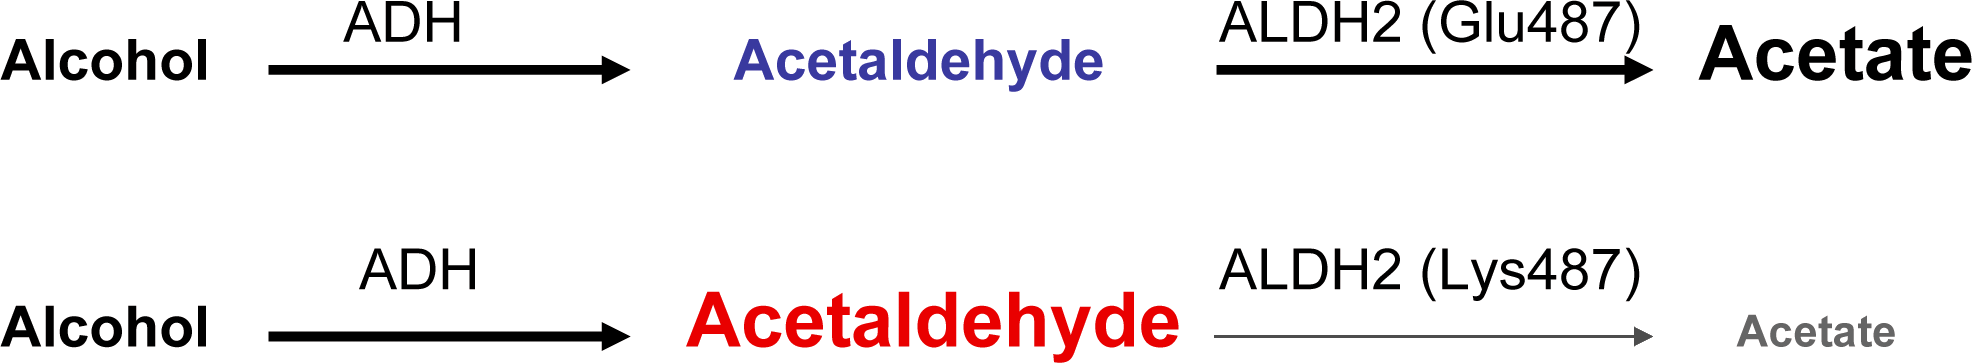 Aldh2 한 쌍이 모두 표준형이 경우 알코올의 대사물인 아세트알데히드가 바로 아세트산으로 바뀌지만(위) 하나가 (487번째 아미노산이 글루탐산에서 라이신으로 바뀐) 변이형인 경우 효율이 크게 떨어져 아세트알데히드가 축적돼 각종 문제가 나타난다(아래). - '플로스 의학' 제공